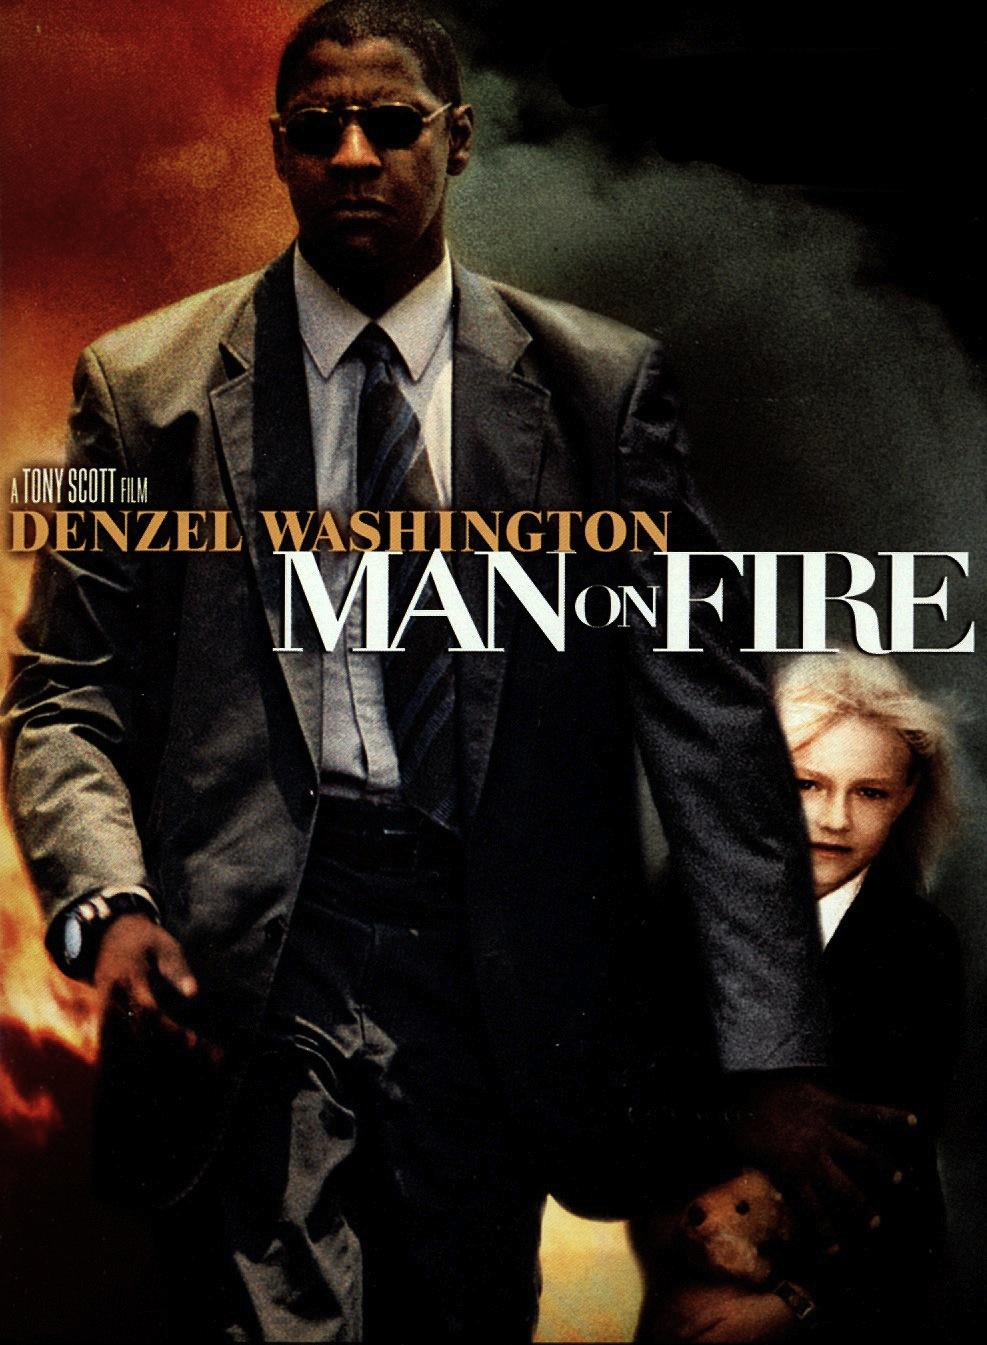 Man on fire / განრისხებული მამაკაცი (2004/GEO/BDRip AVC) (ქართულად)